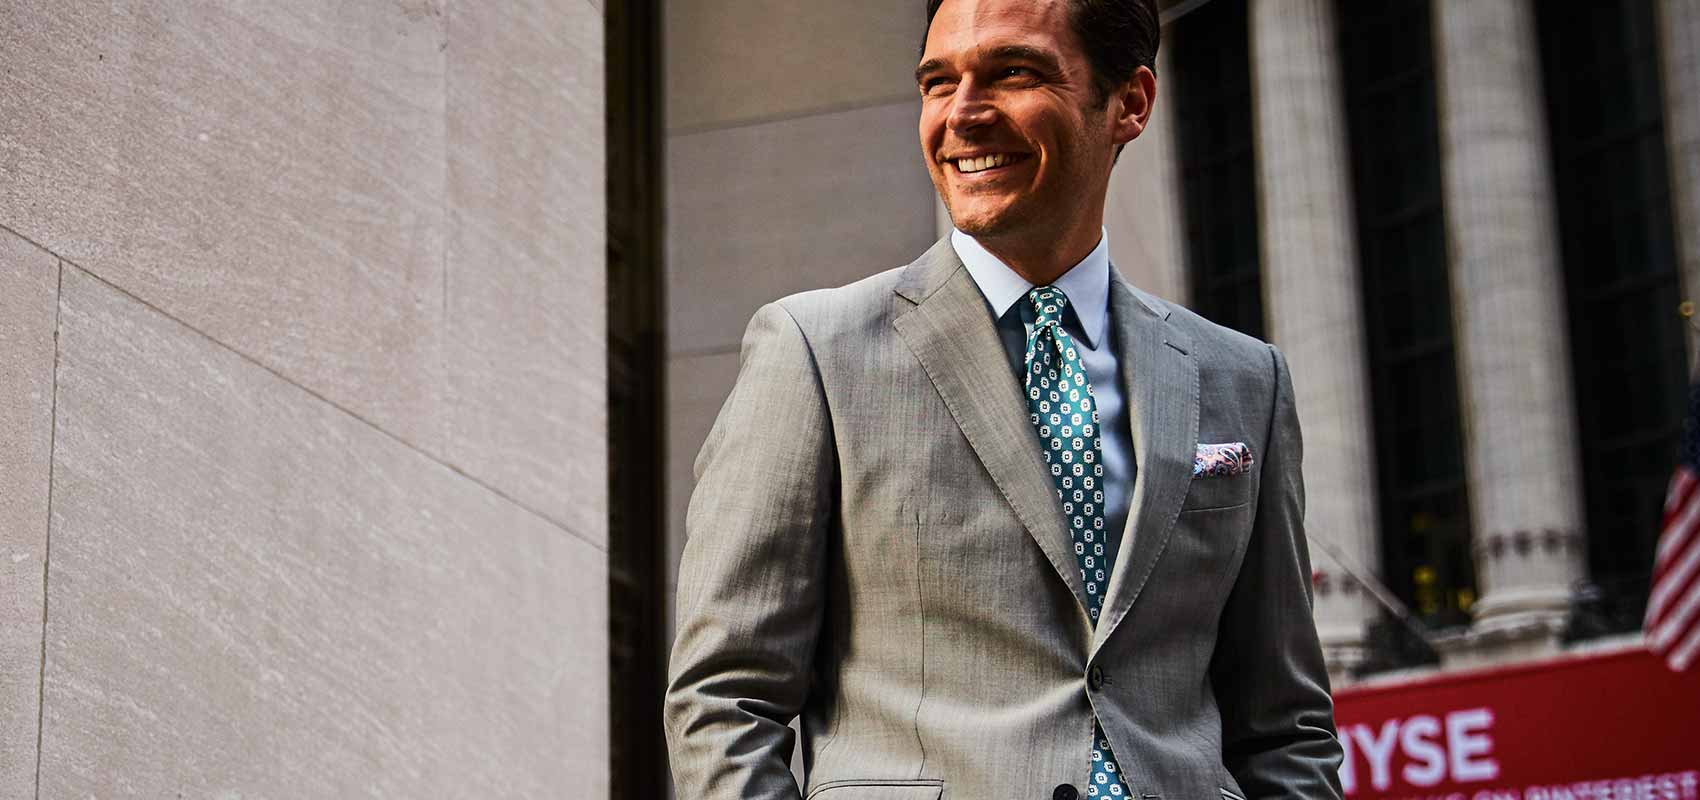 Charles Tyrwhitt grey suits